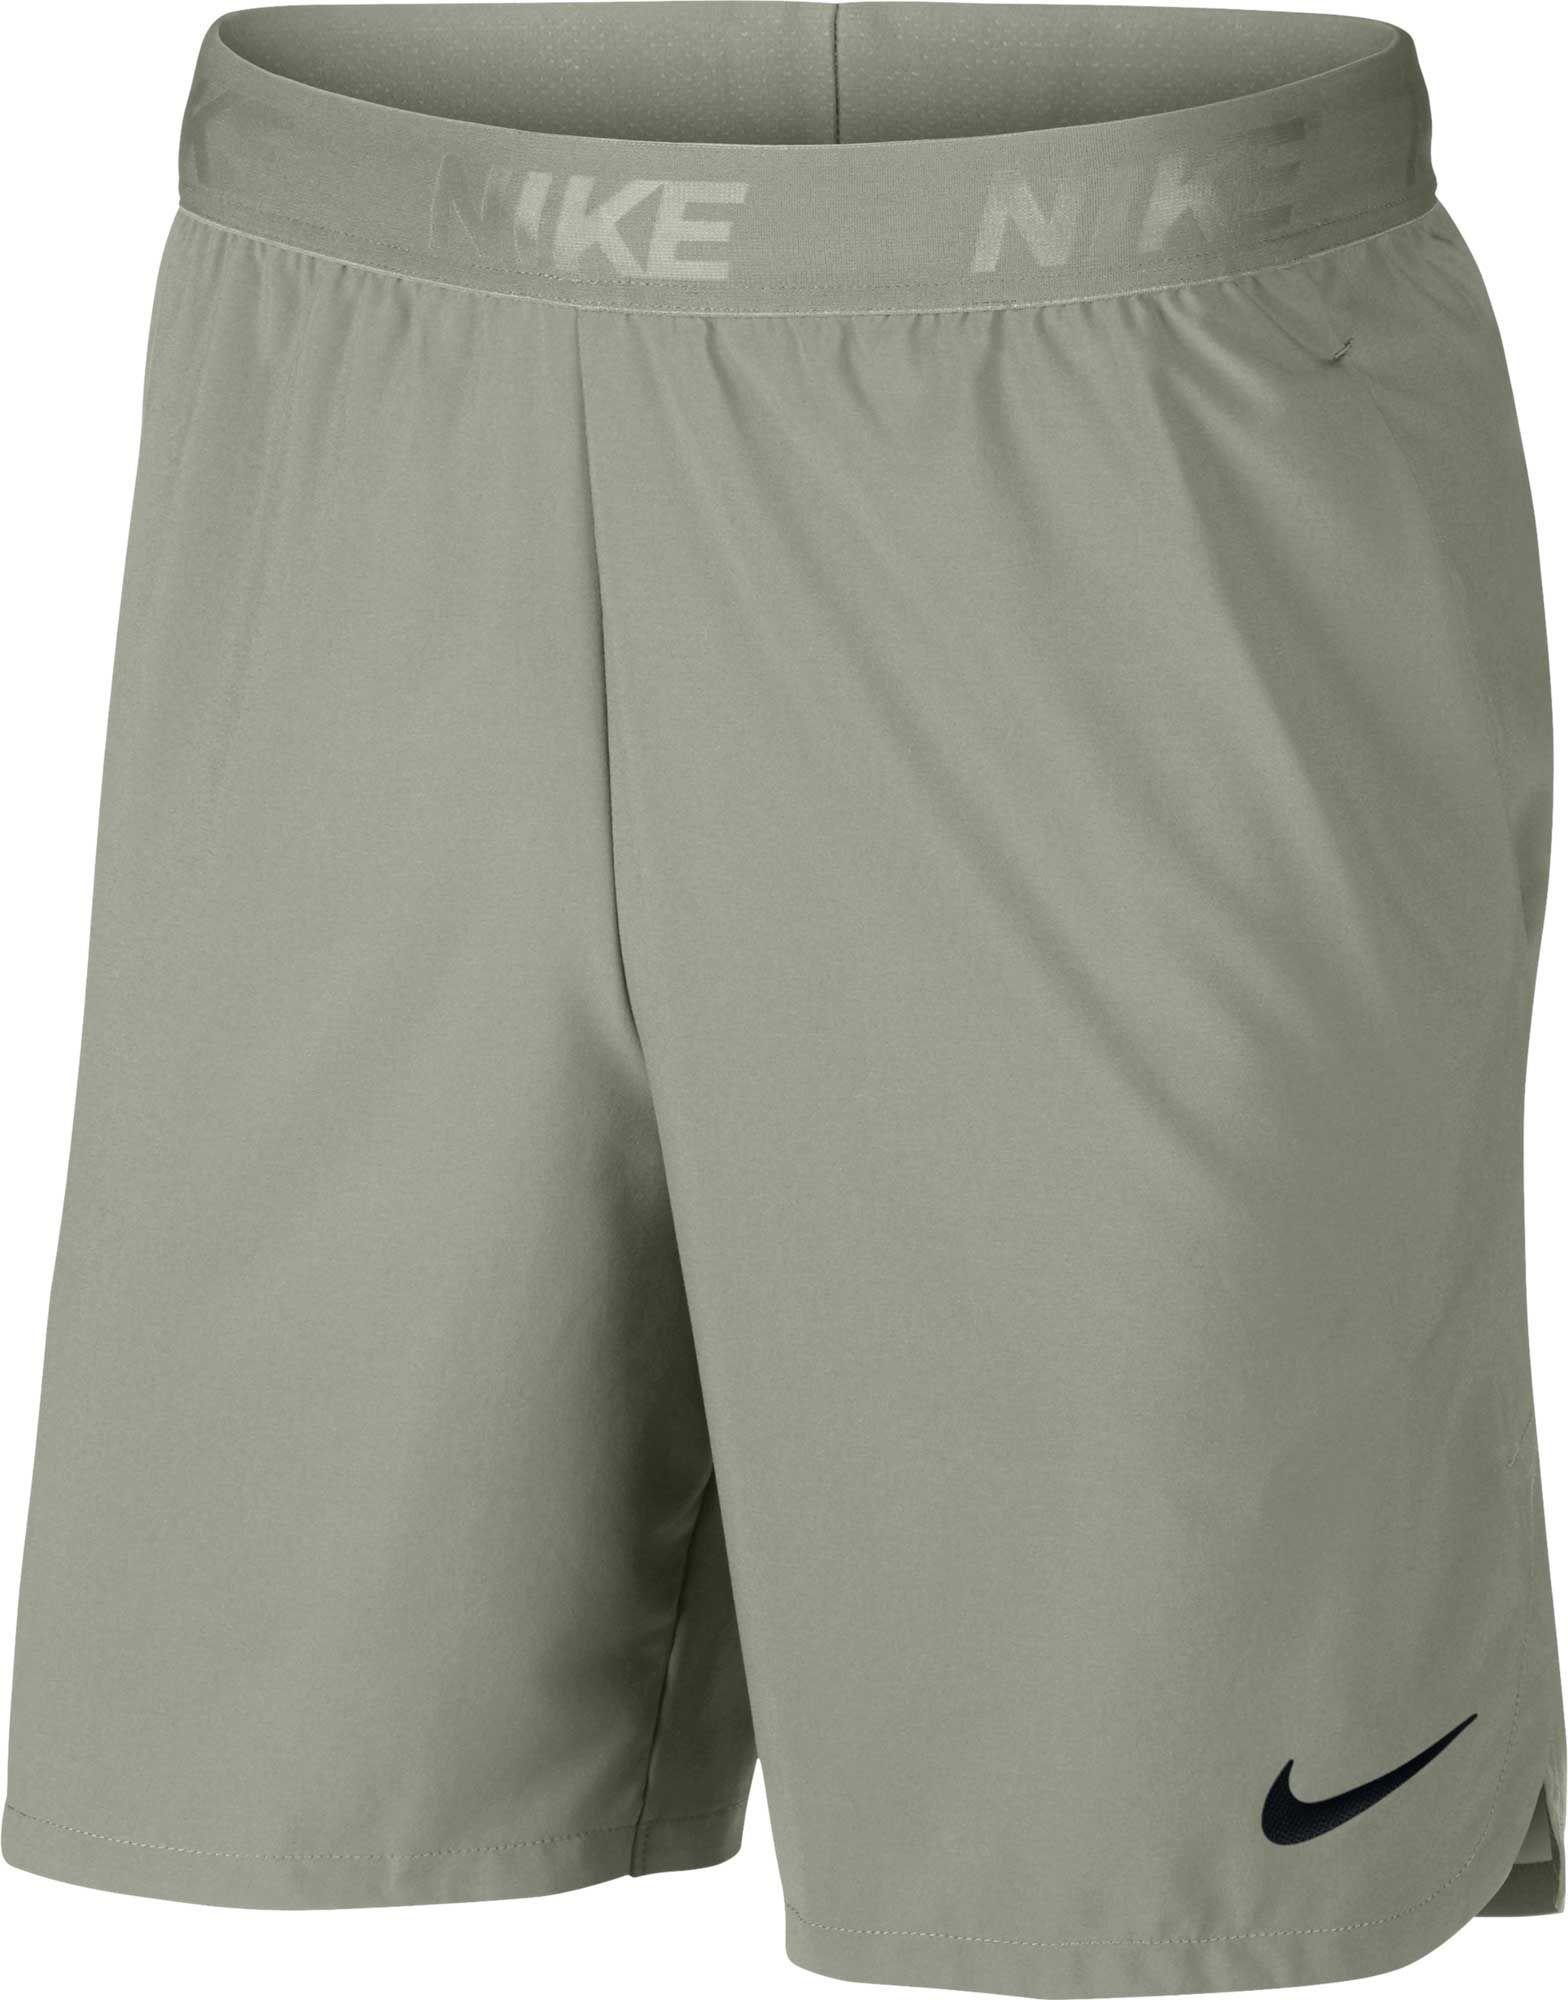 6383b1d2c3290 Lyst - Nike Flex Vent Max 2.0 Training Shorts in Green for Men